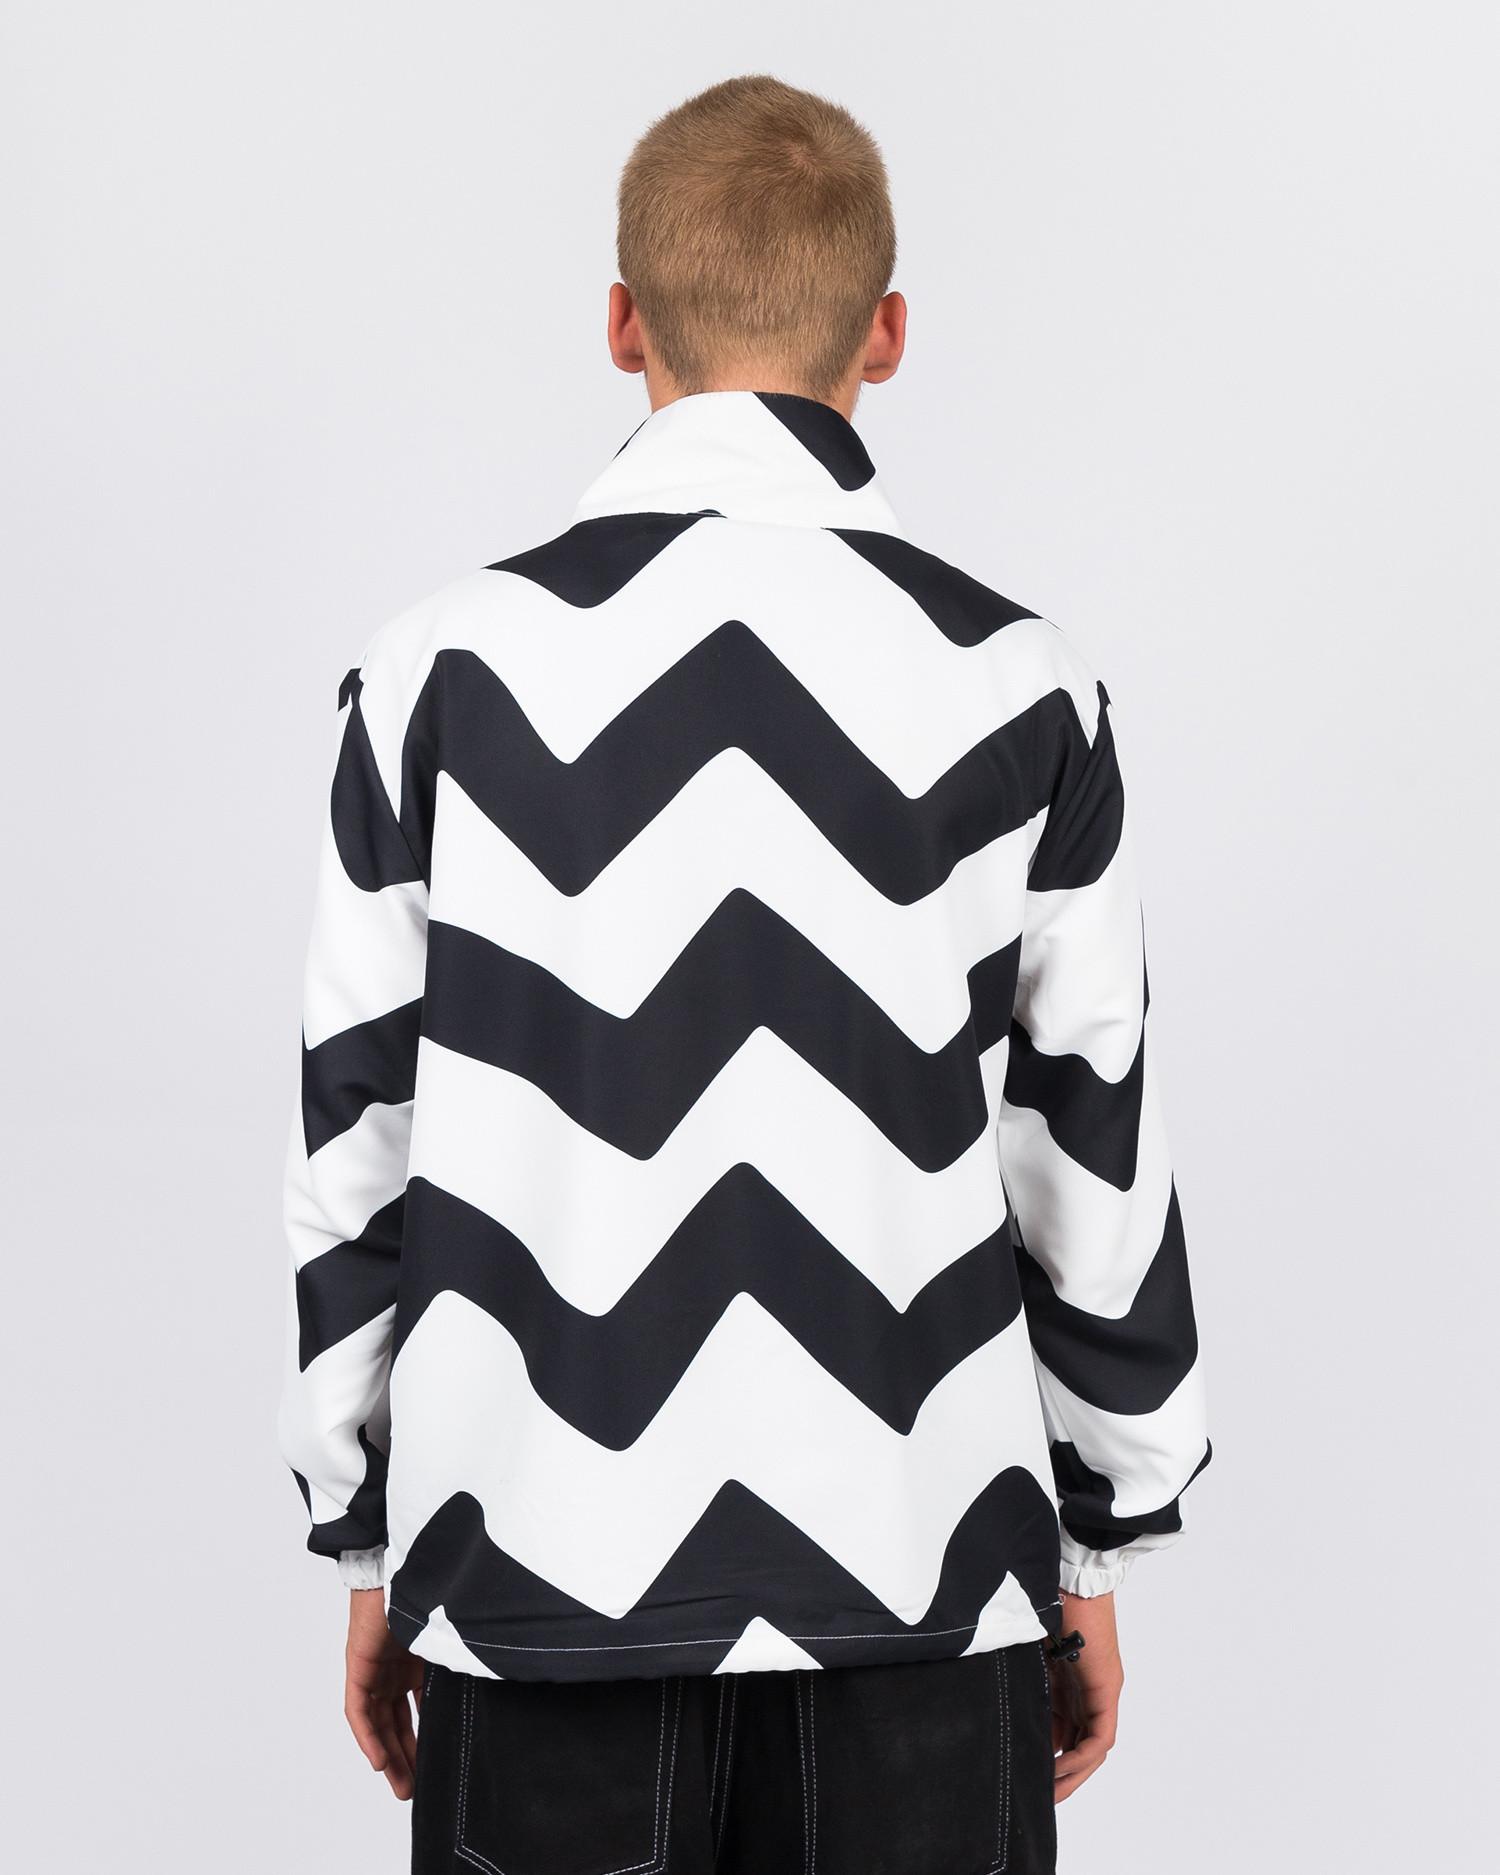 Parra vase mountain stripes windbreaker black/white